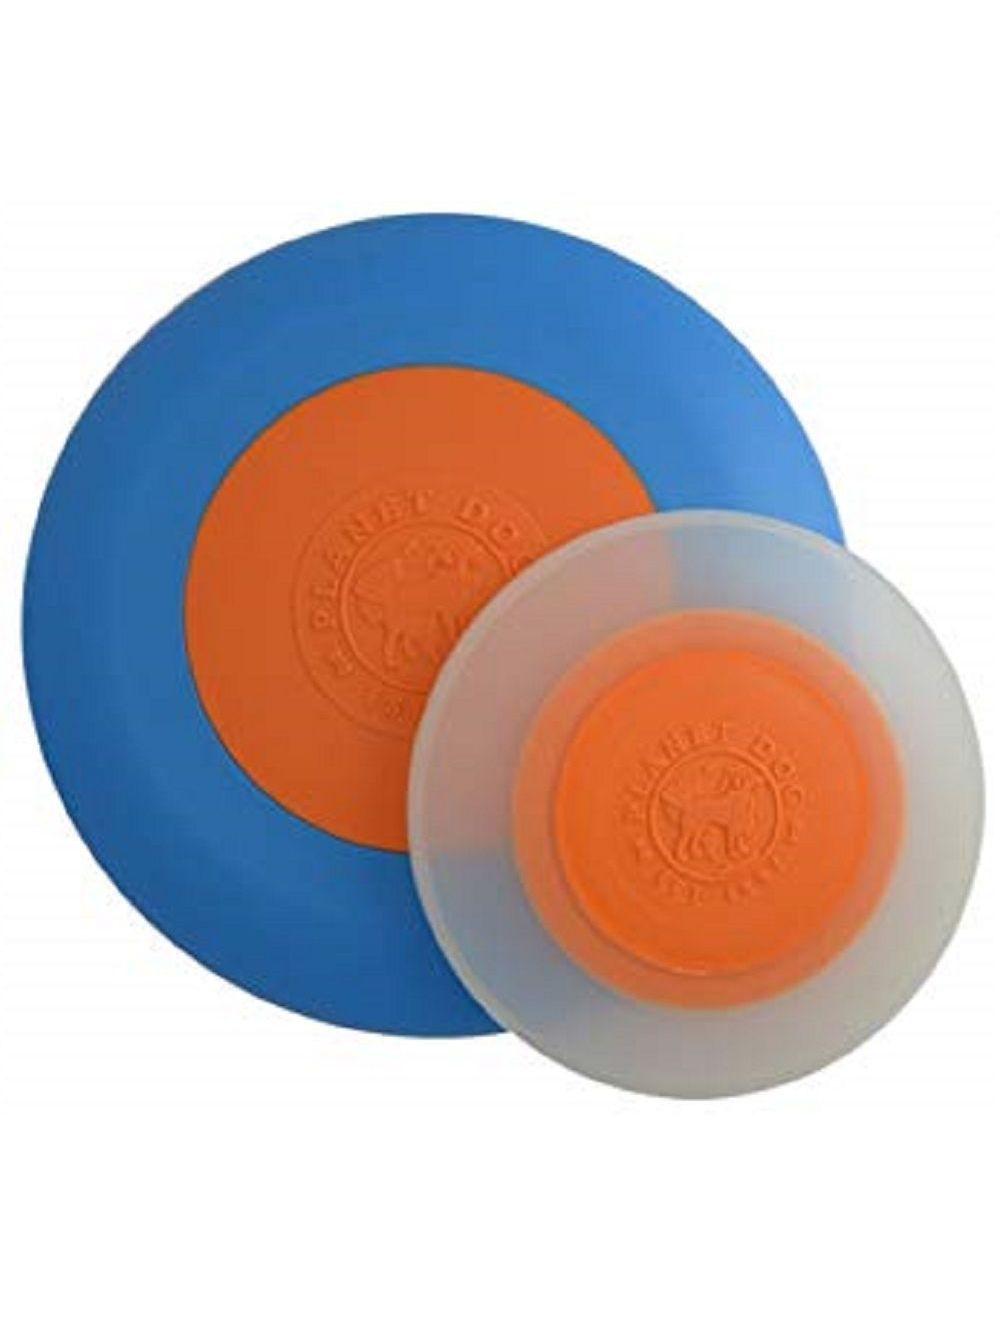 Planet dog frisbee zoom azul-naranja small